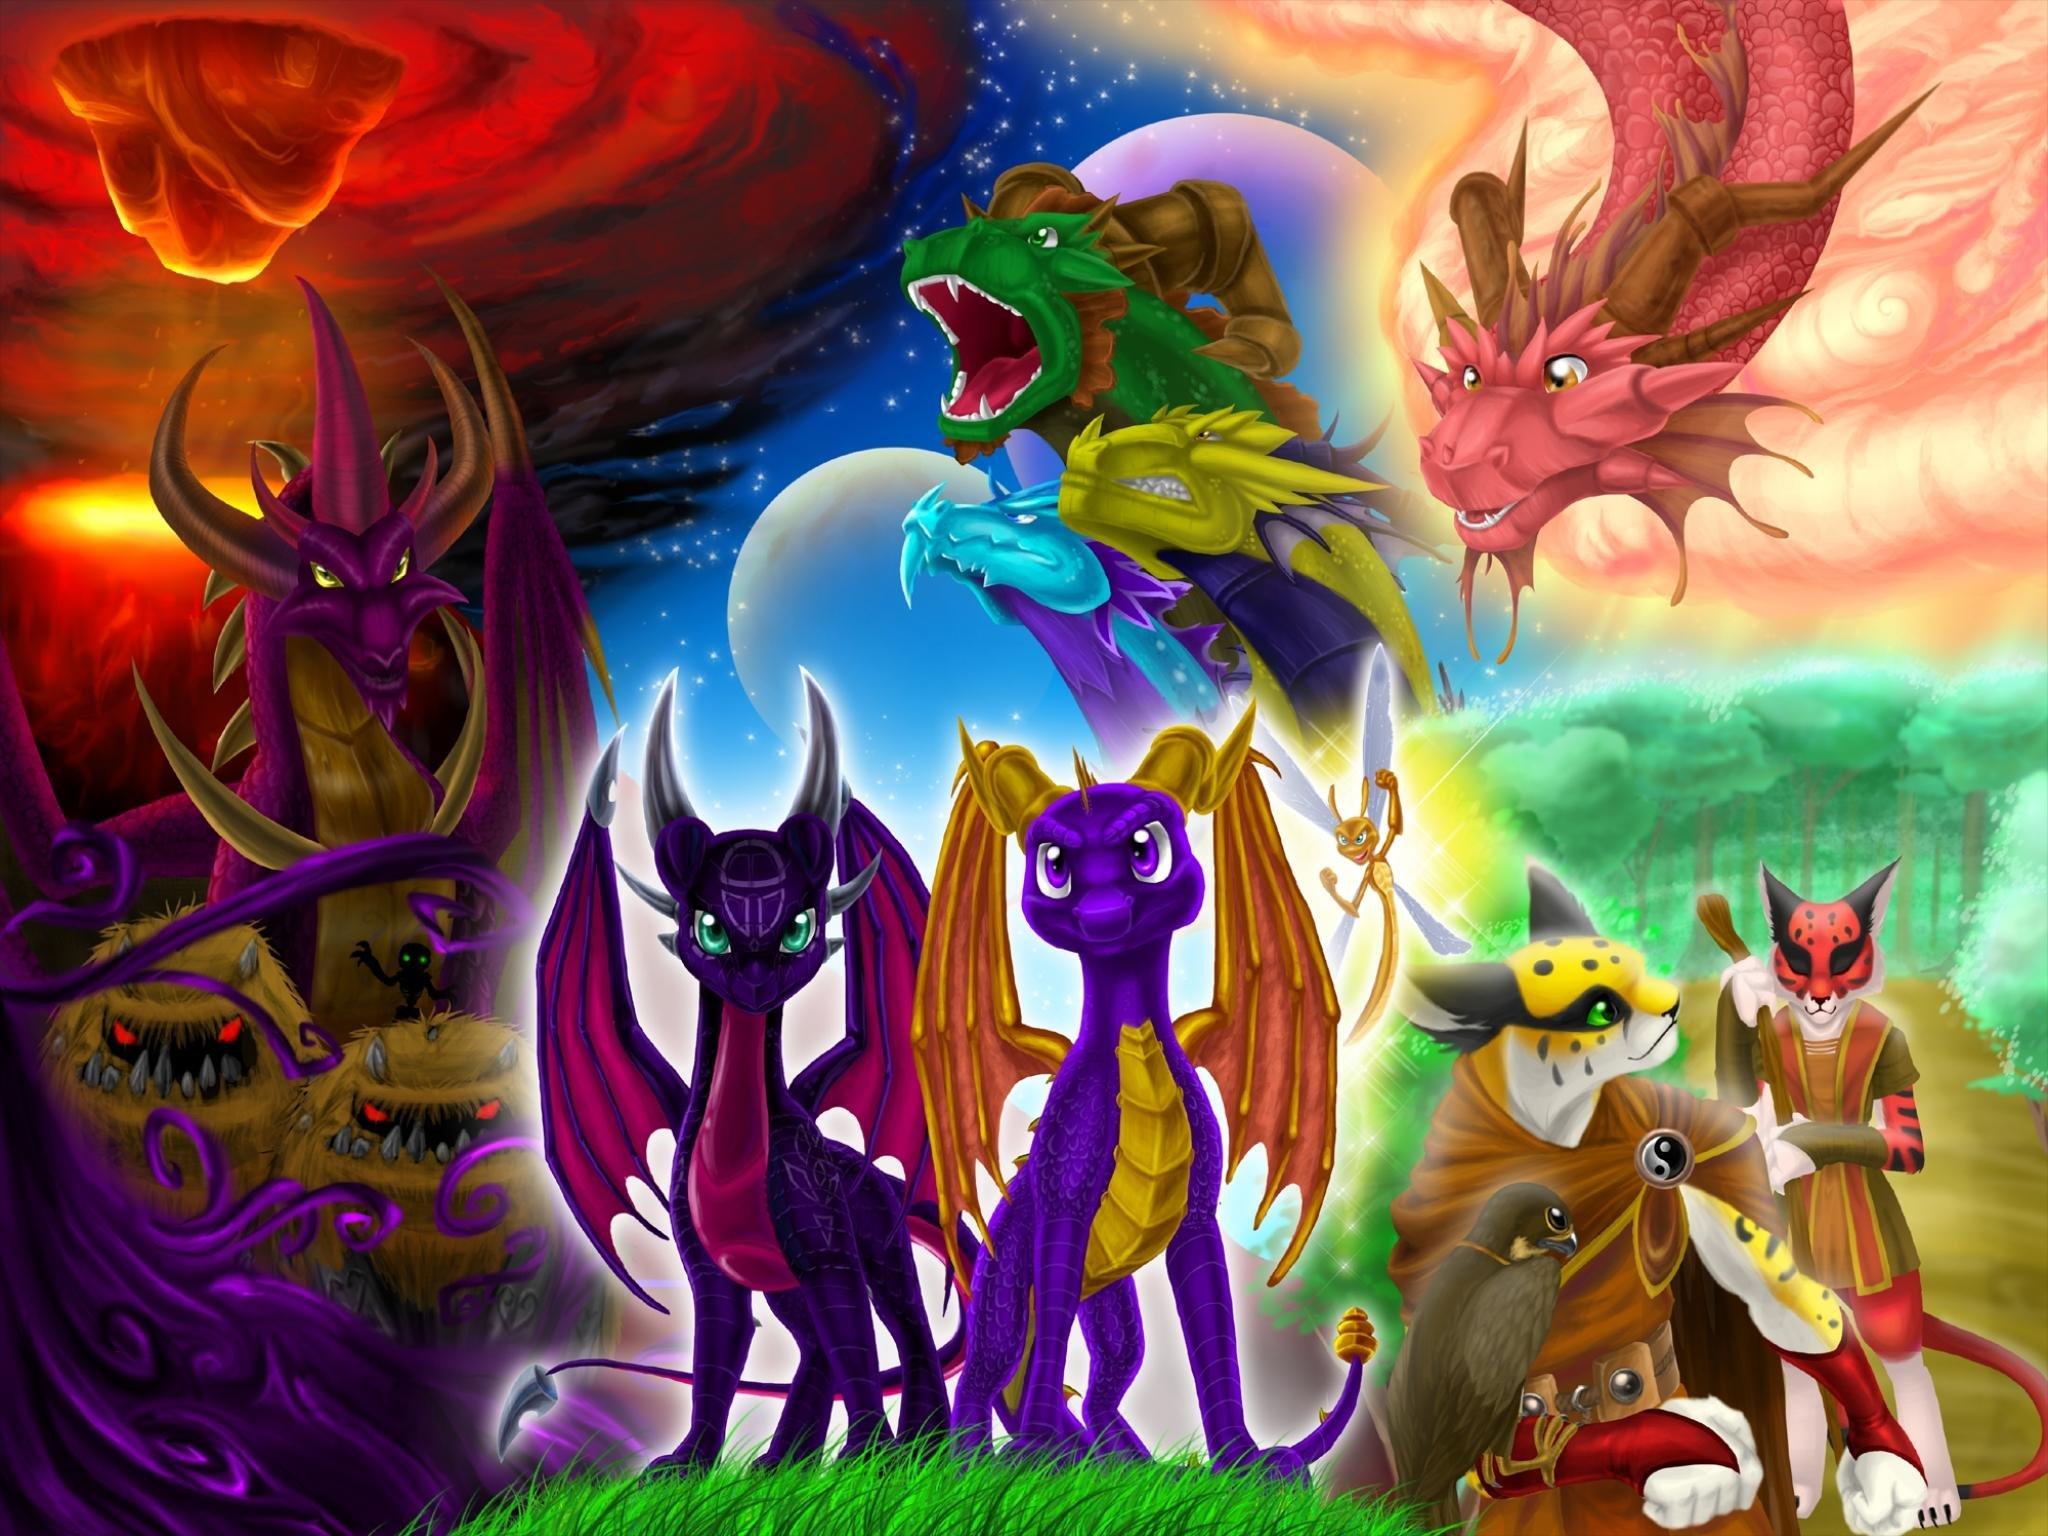 Free Spyro The Dragon High Quality Background Id 231538 For Hd